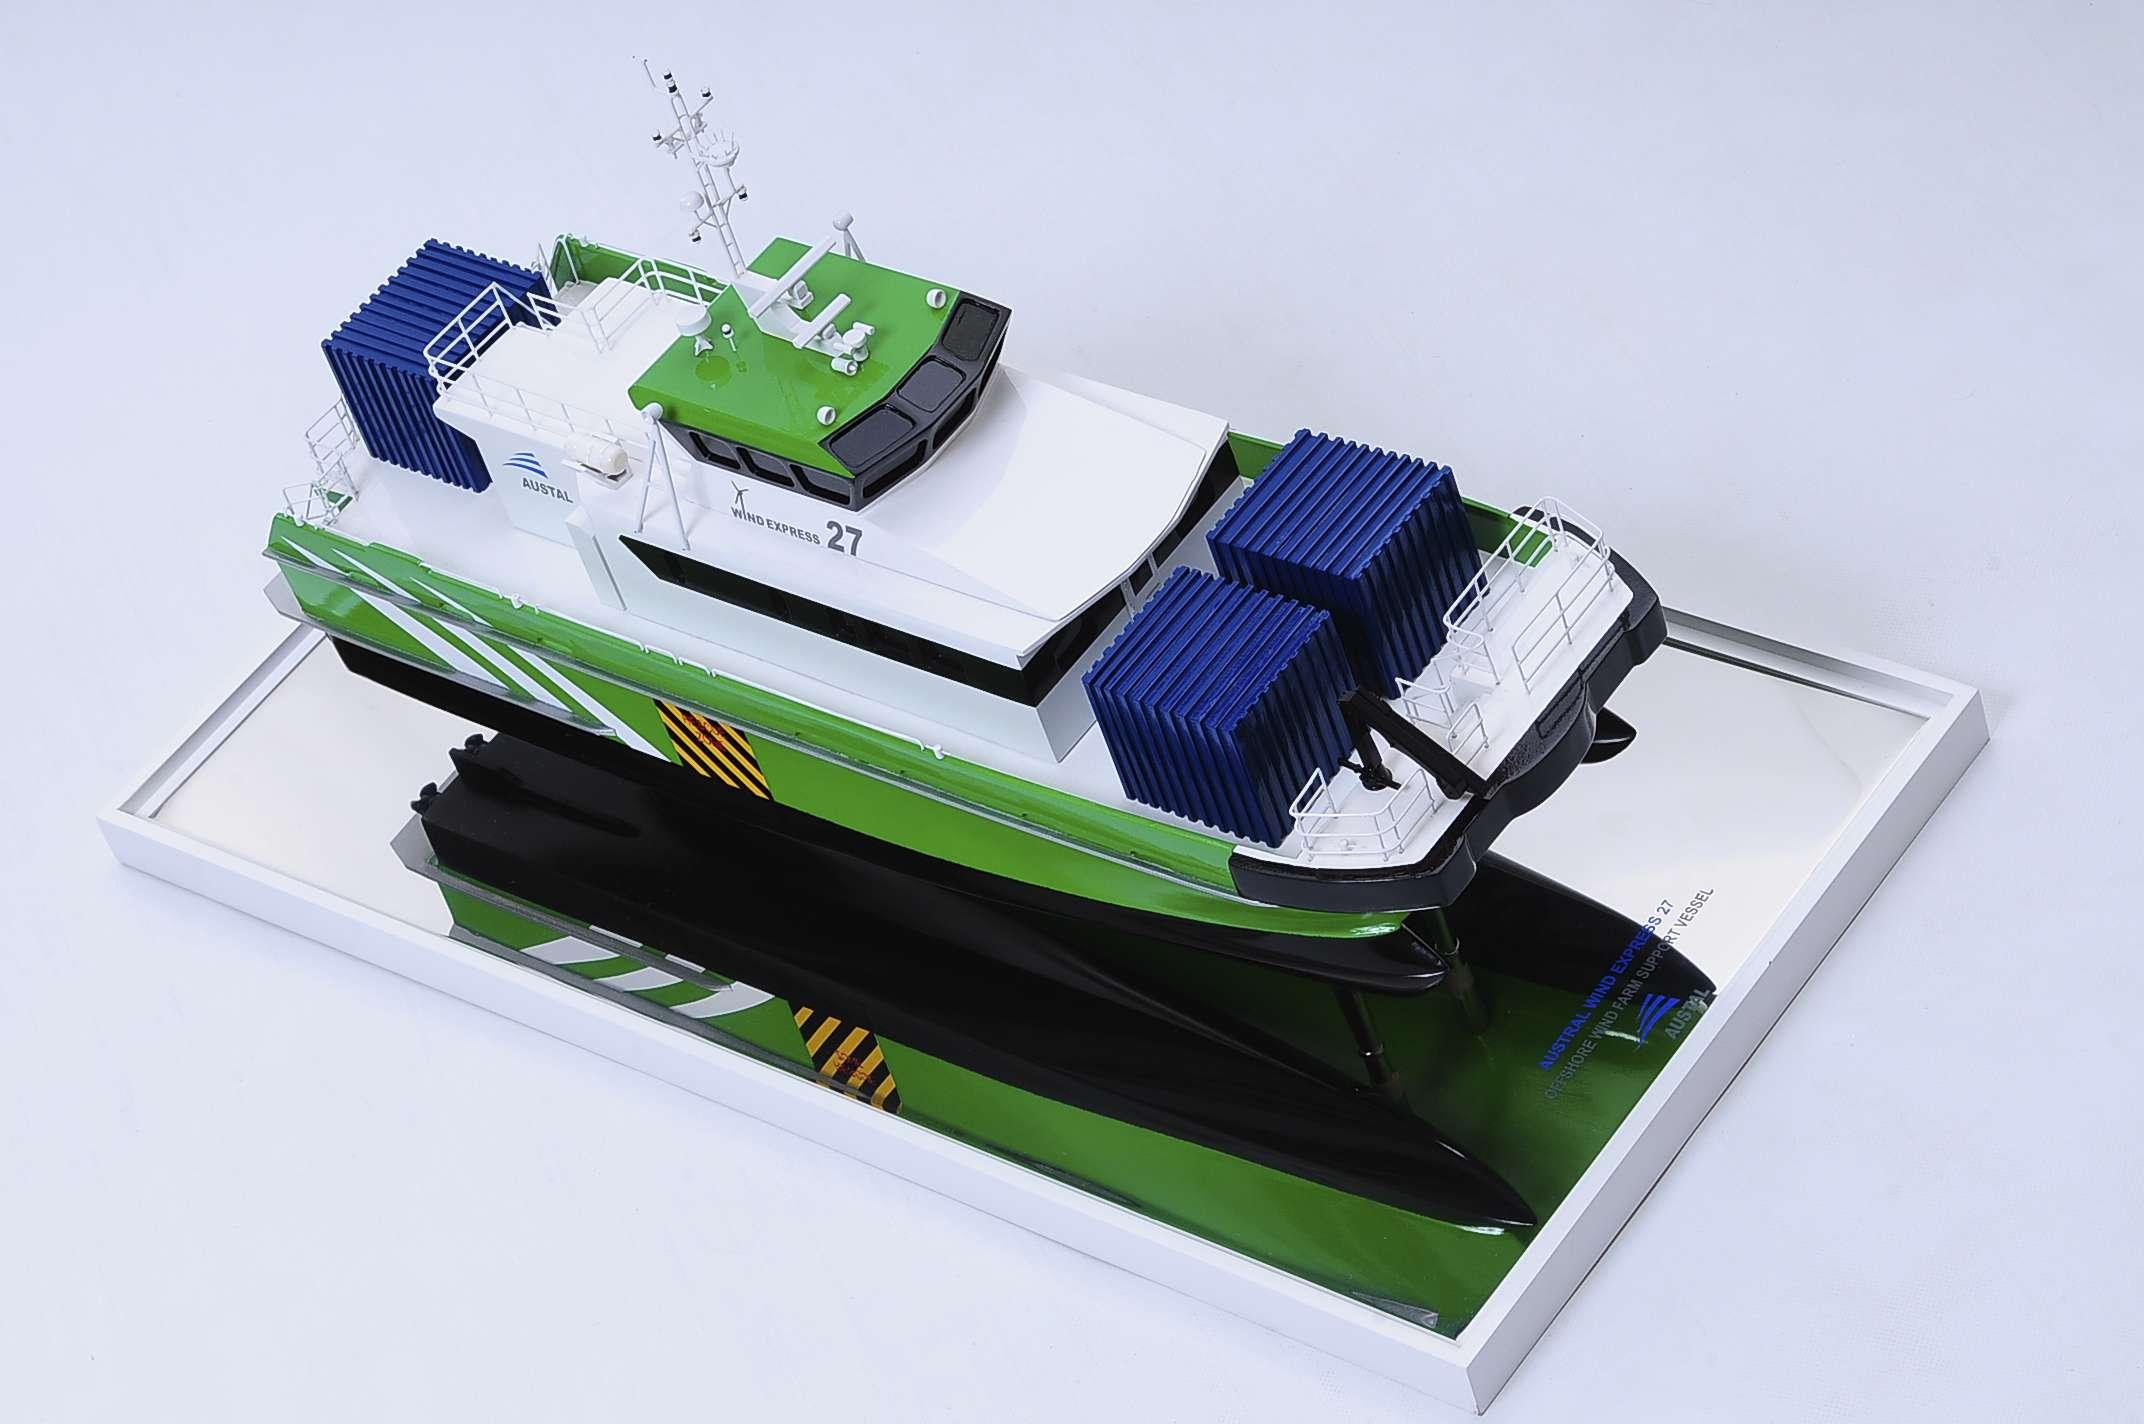 1440-4949-Wind-Express-27-Catamaran-Model